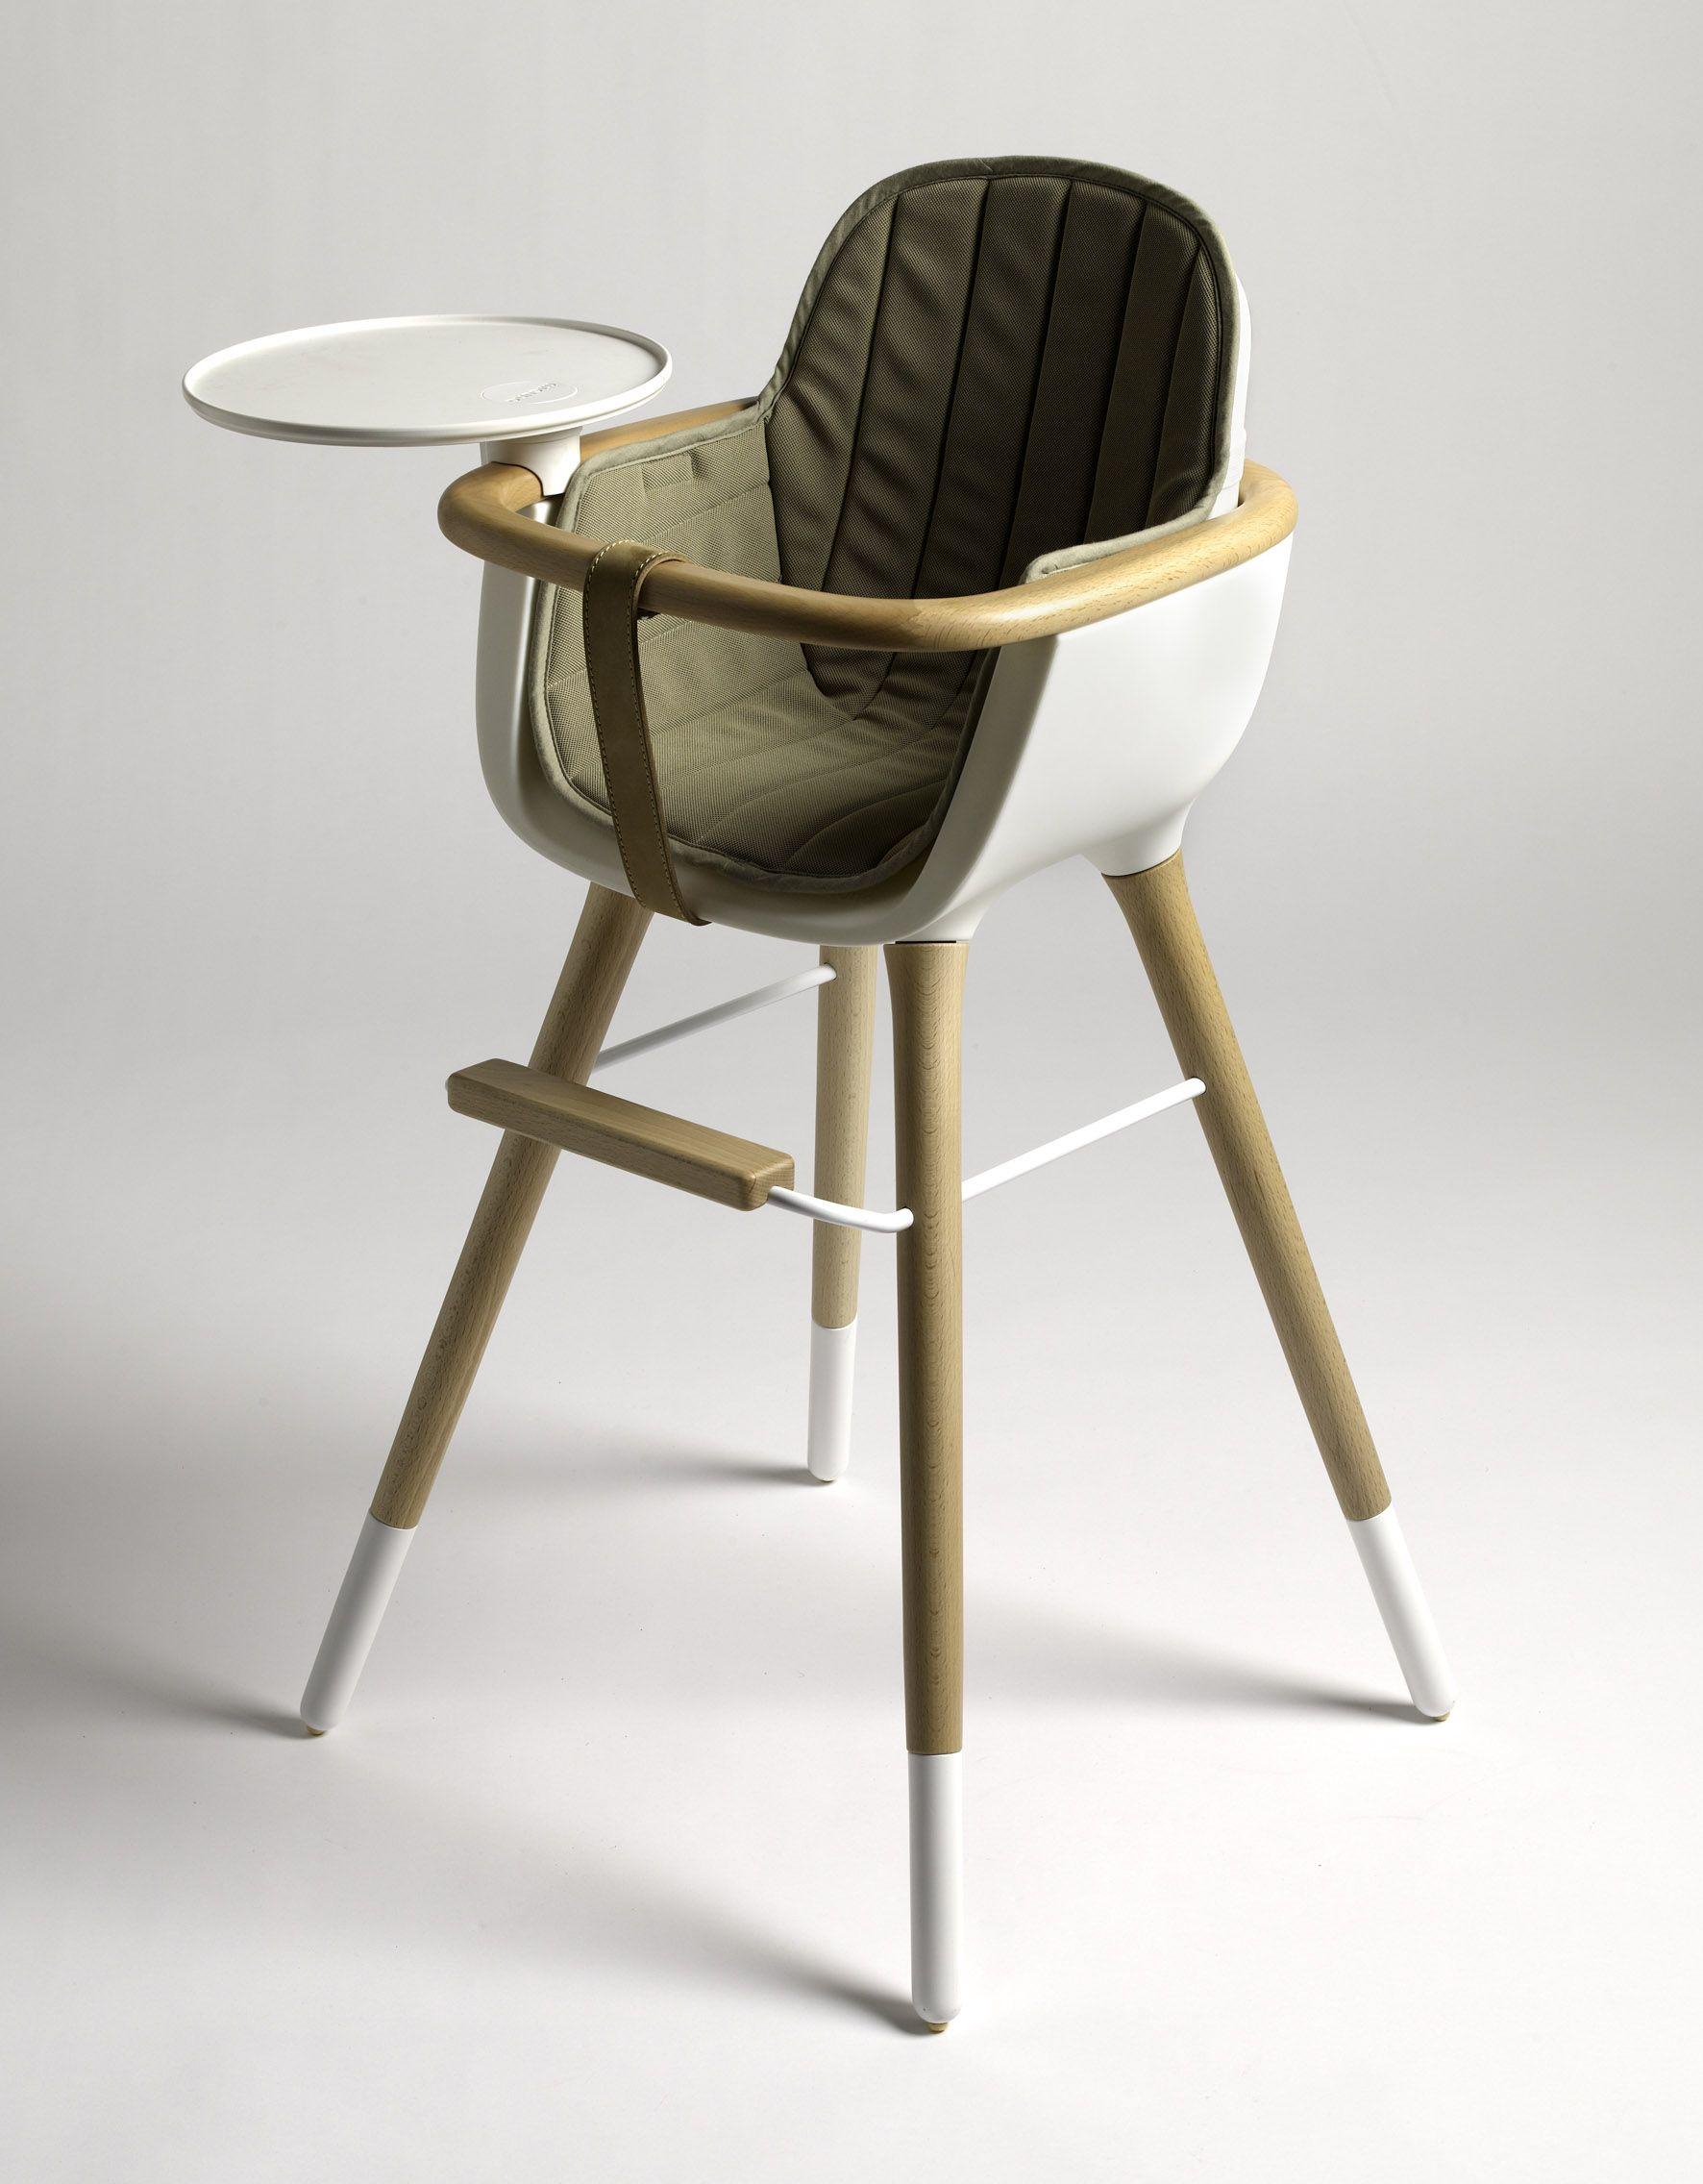 Epingle Par Le Tresor De Bebe Design Baby Sur Chaise Haute Bebe Ovo De Micuna Chaise Haute Chaise Haute Design Chaise Haute Bebe